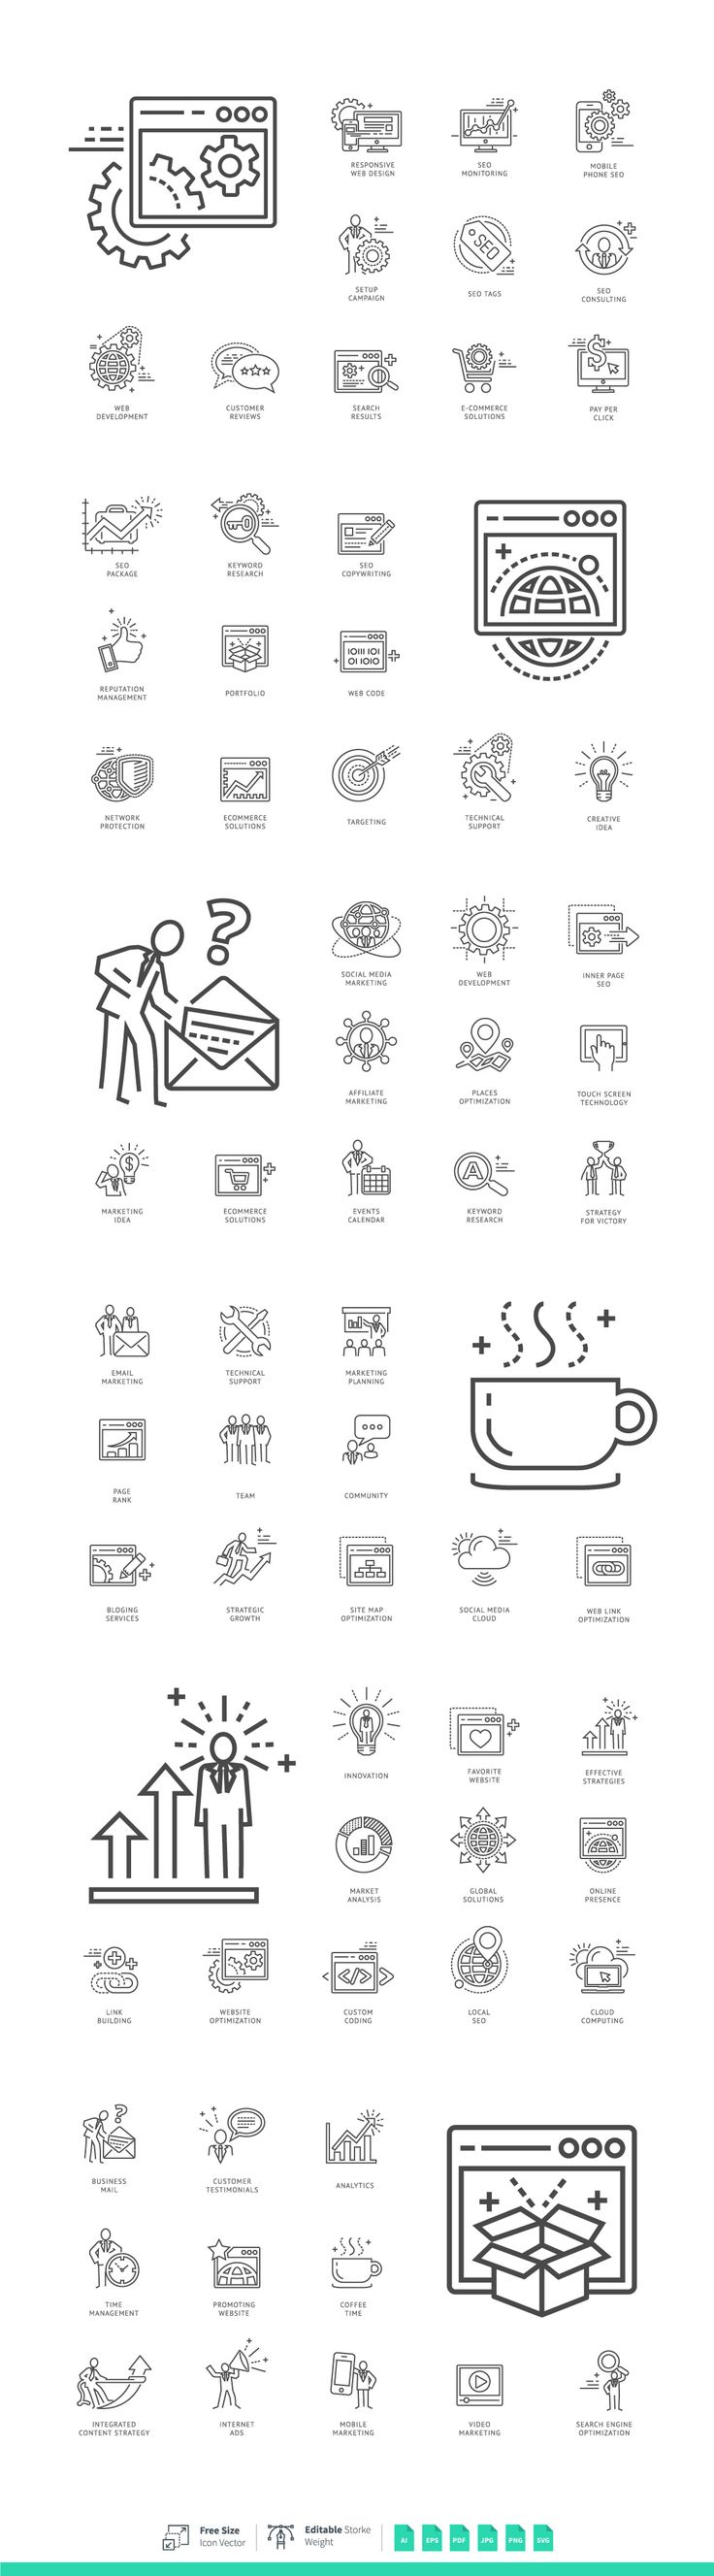 SEO Internet & Marketing Services by korawan.m on @creativemarket